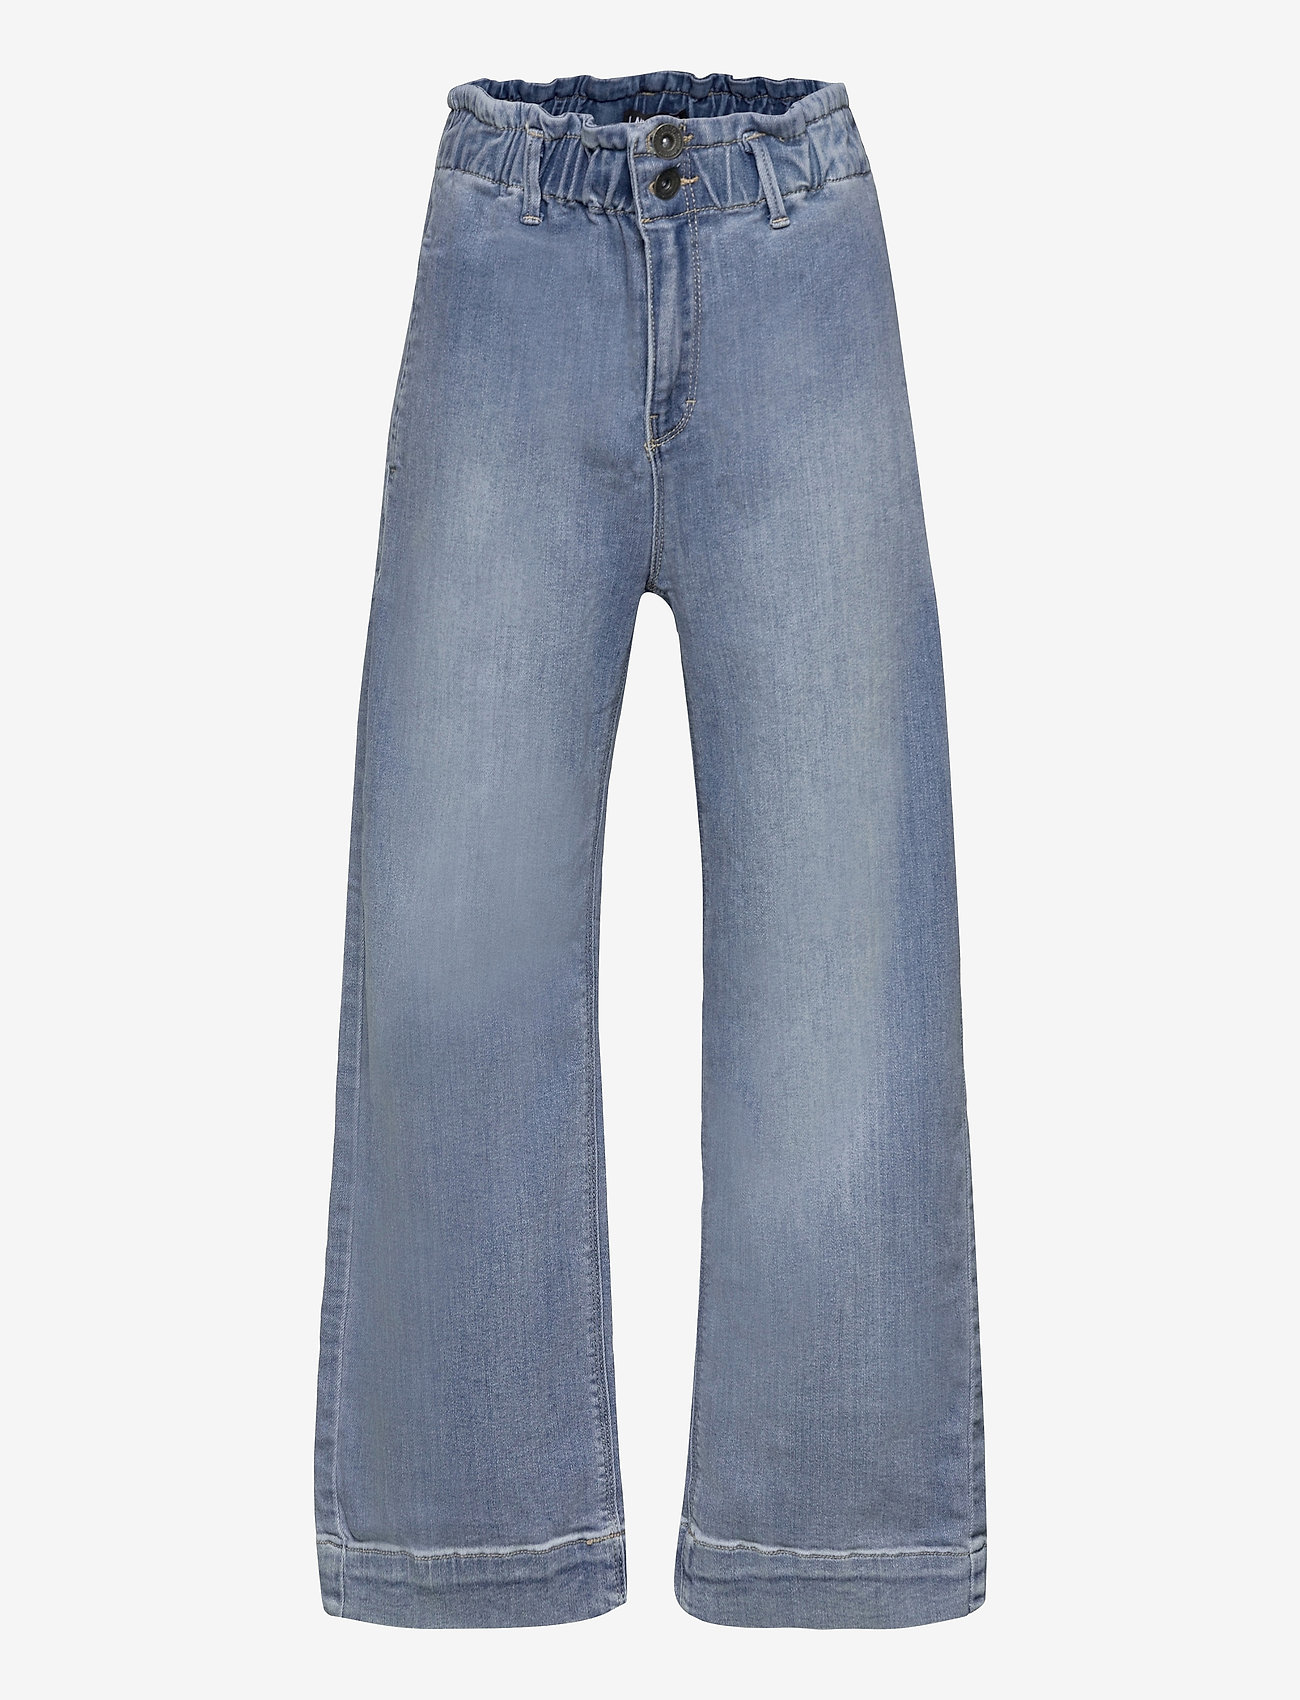 LMTD - NLFBIDE DNMATASPERS 1467 A PANT - jeans - light blue denim - 0